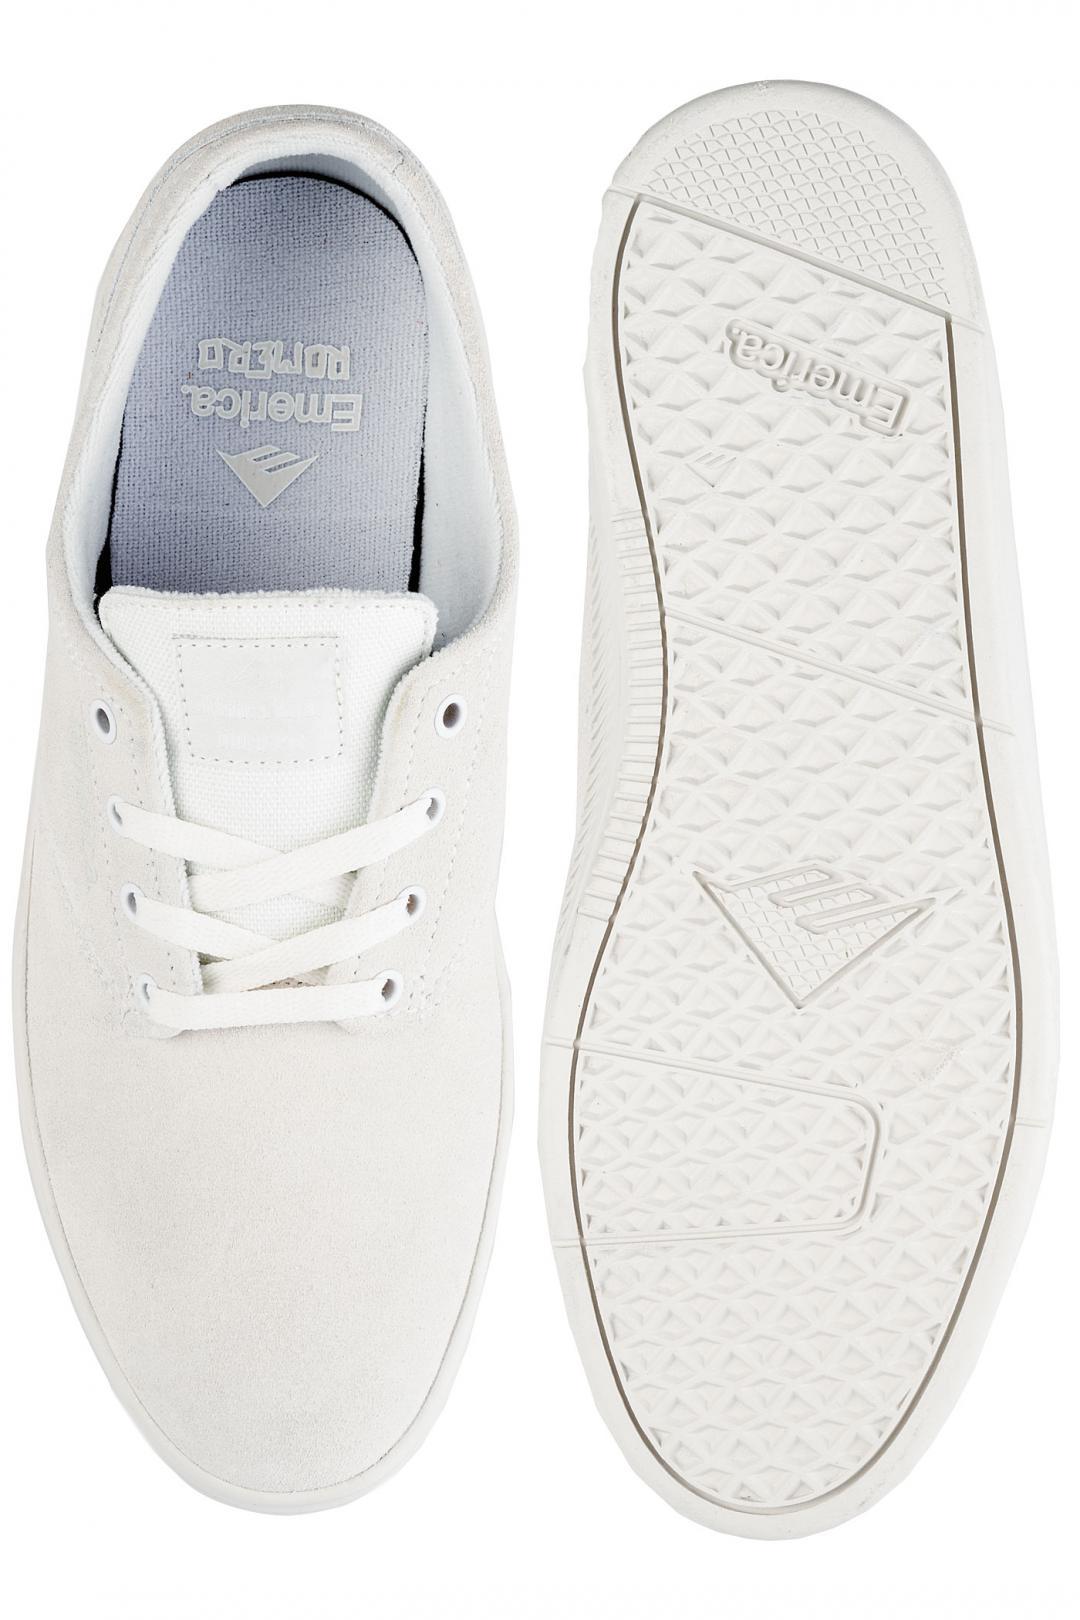 Uomo Emerica The Romero Laced white white white   Sneakers low top